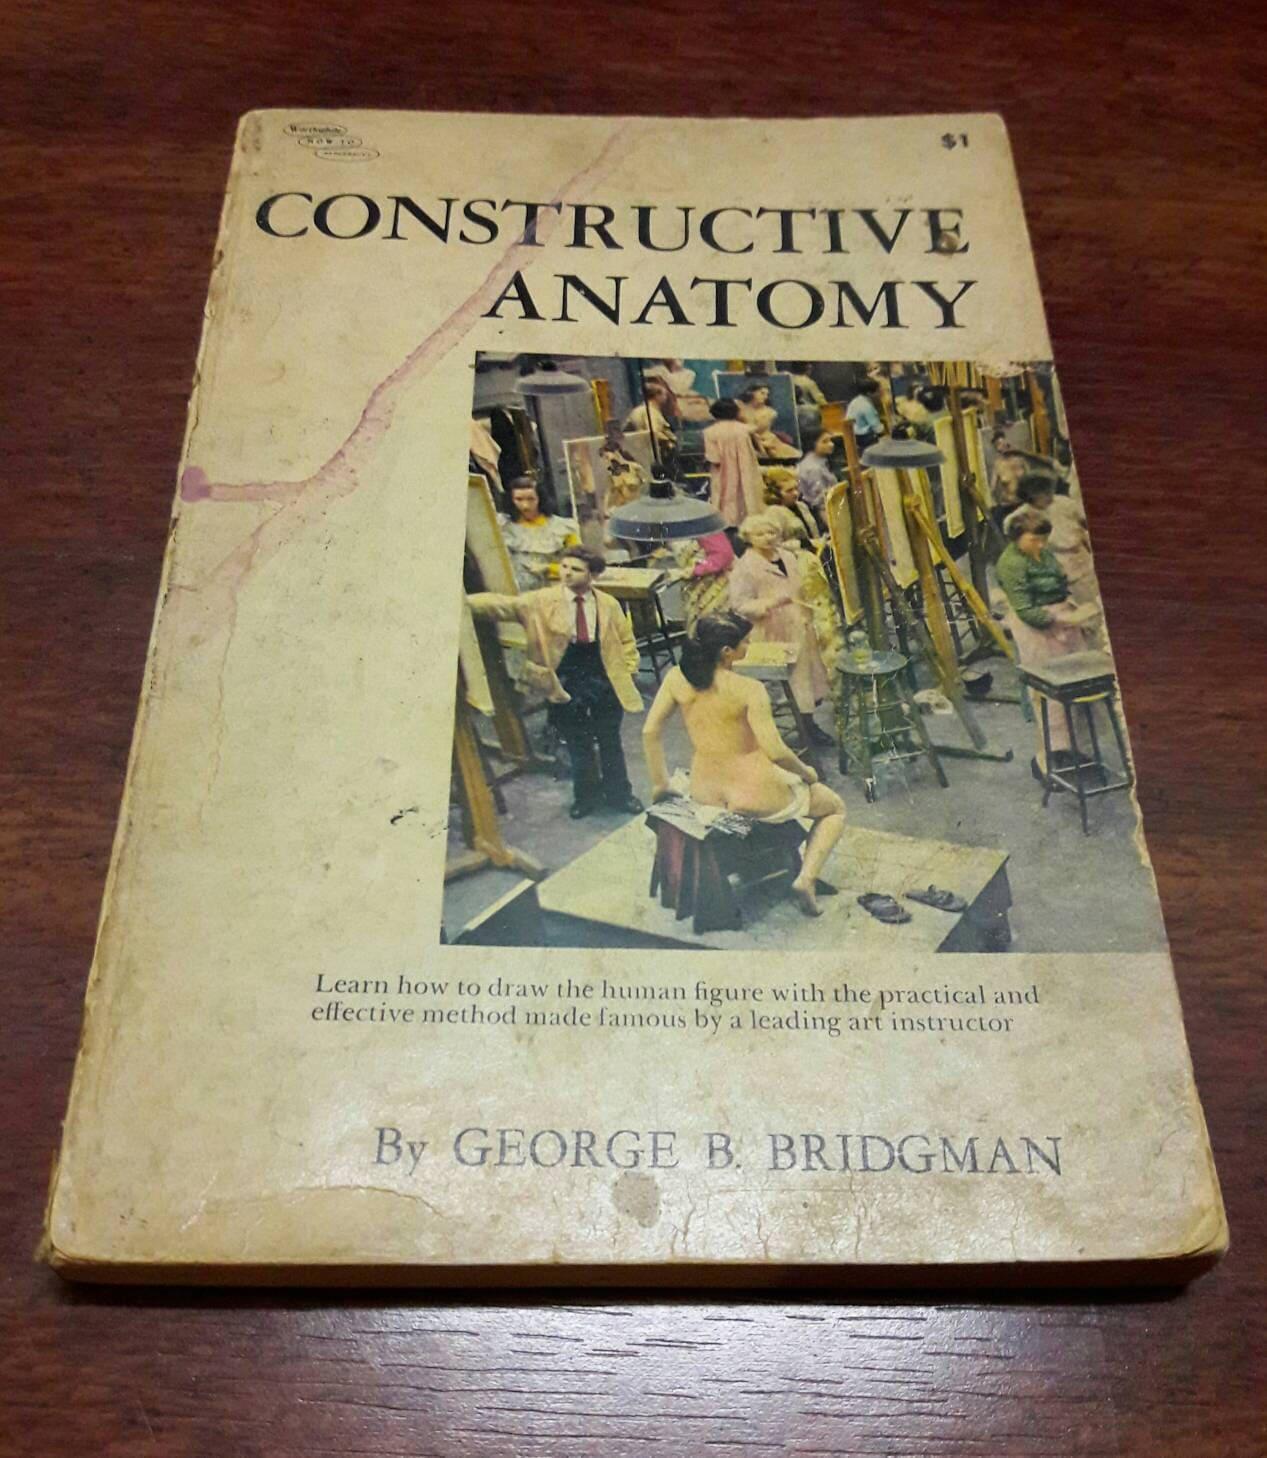 Konstruktive Anatomie von George B. Bridgman Vintage Kunst   Etsy